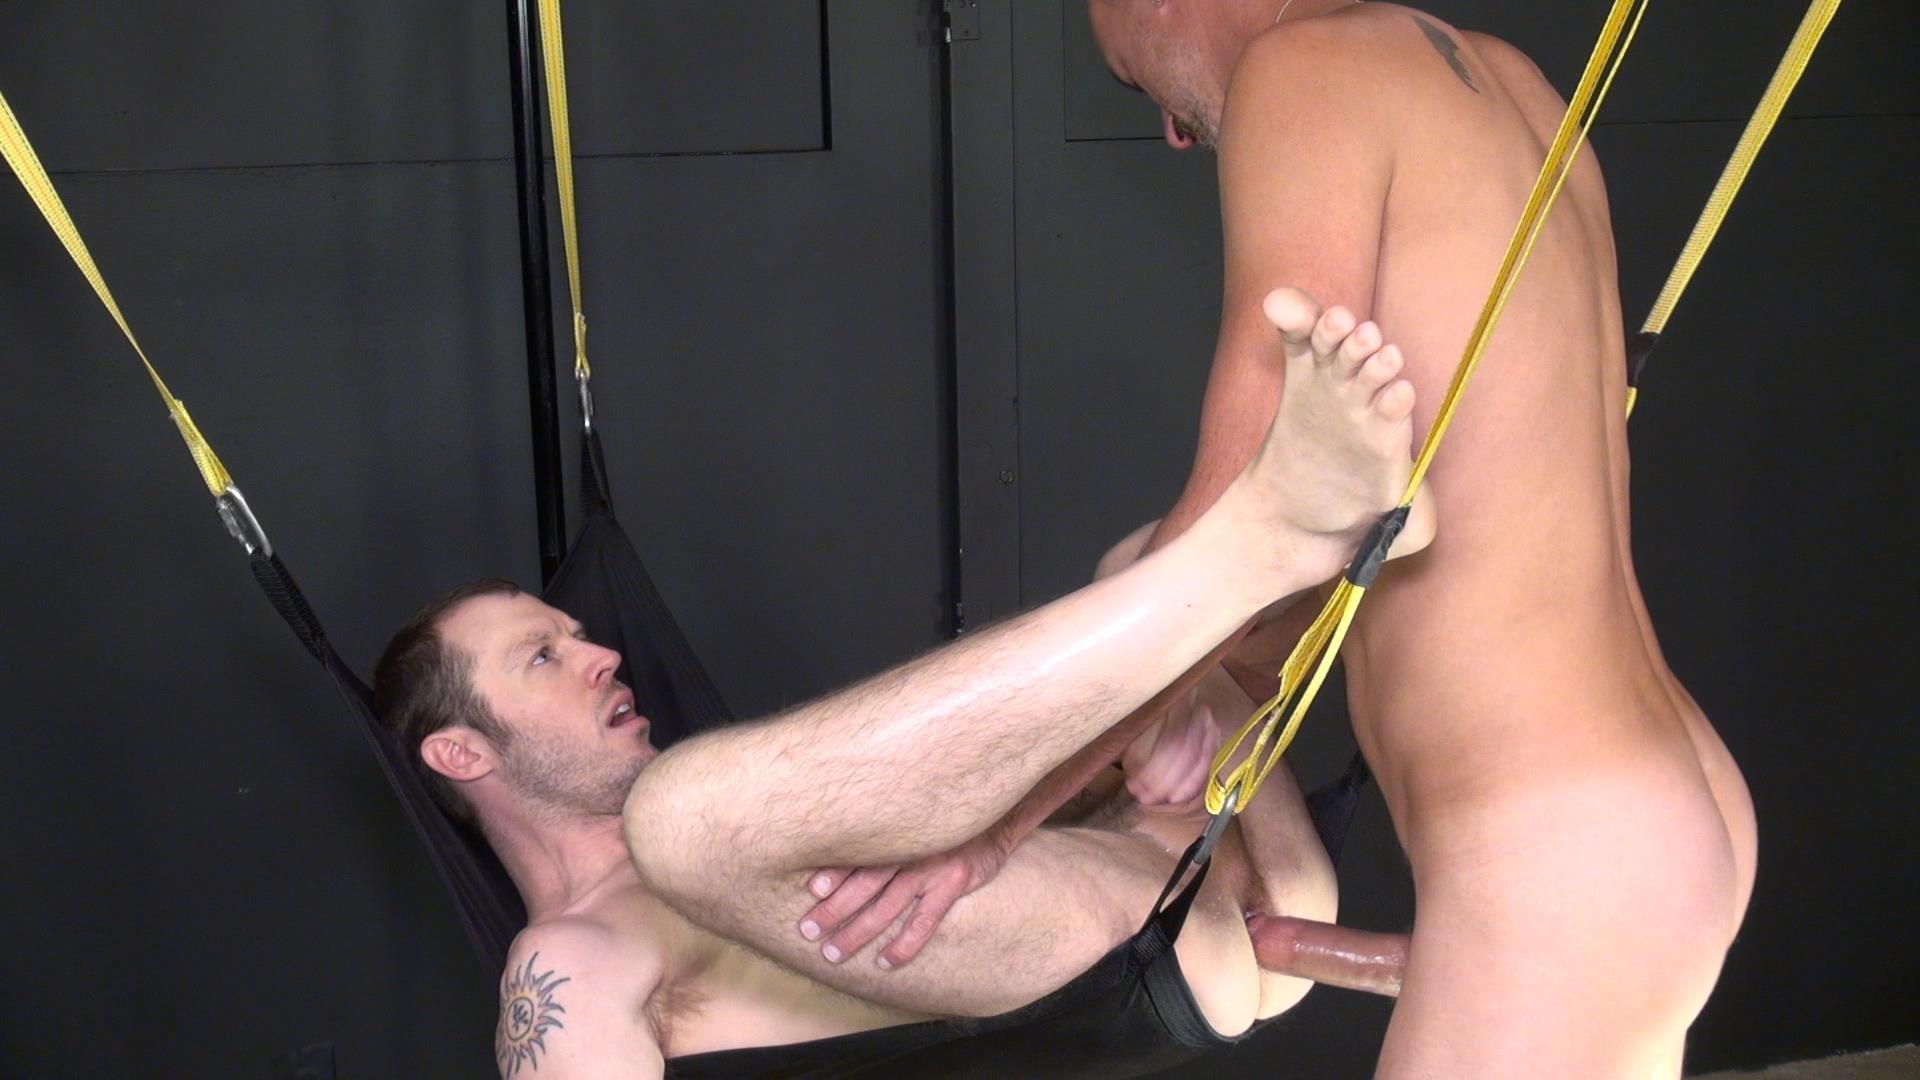 Gay bareback his tight ass hardcore